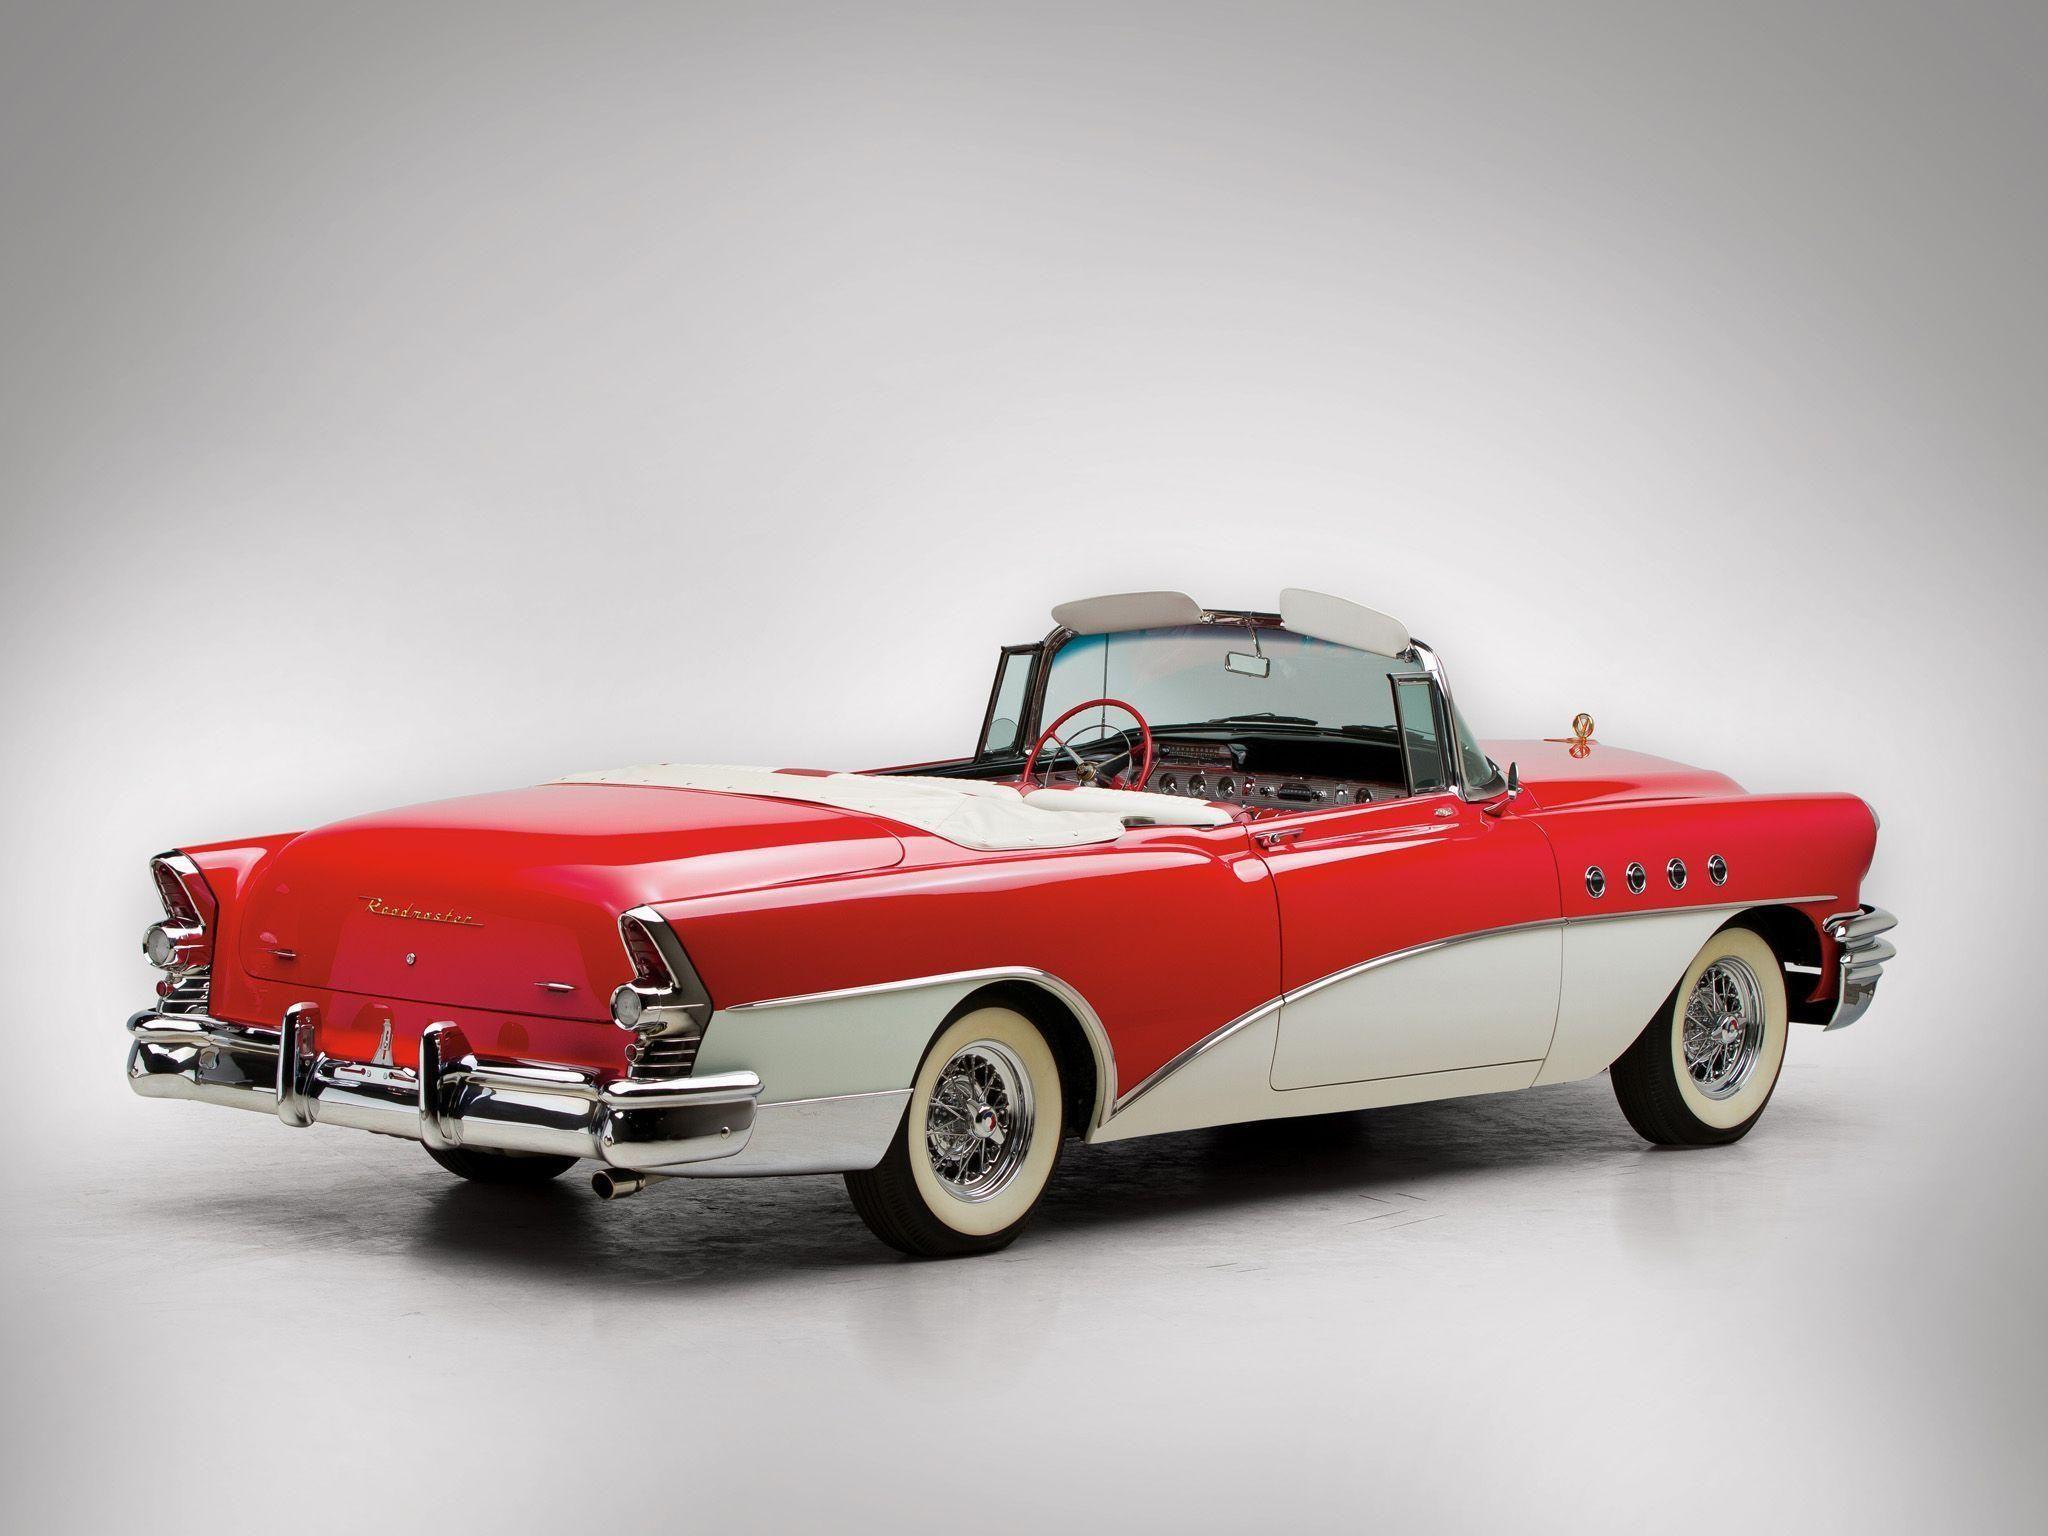 1955 Buick Roadmaster Convertible cars